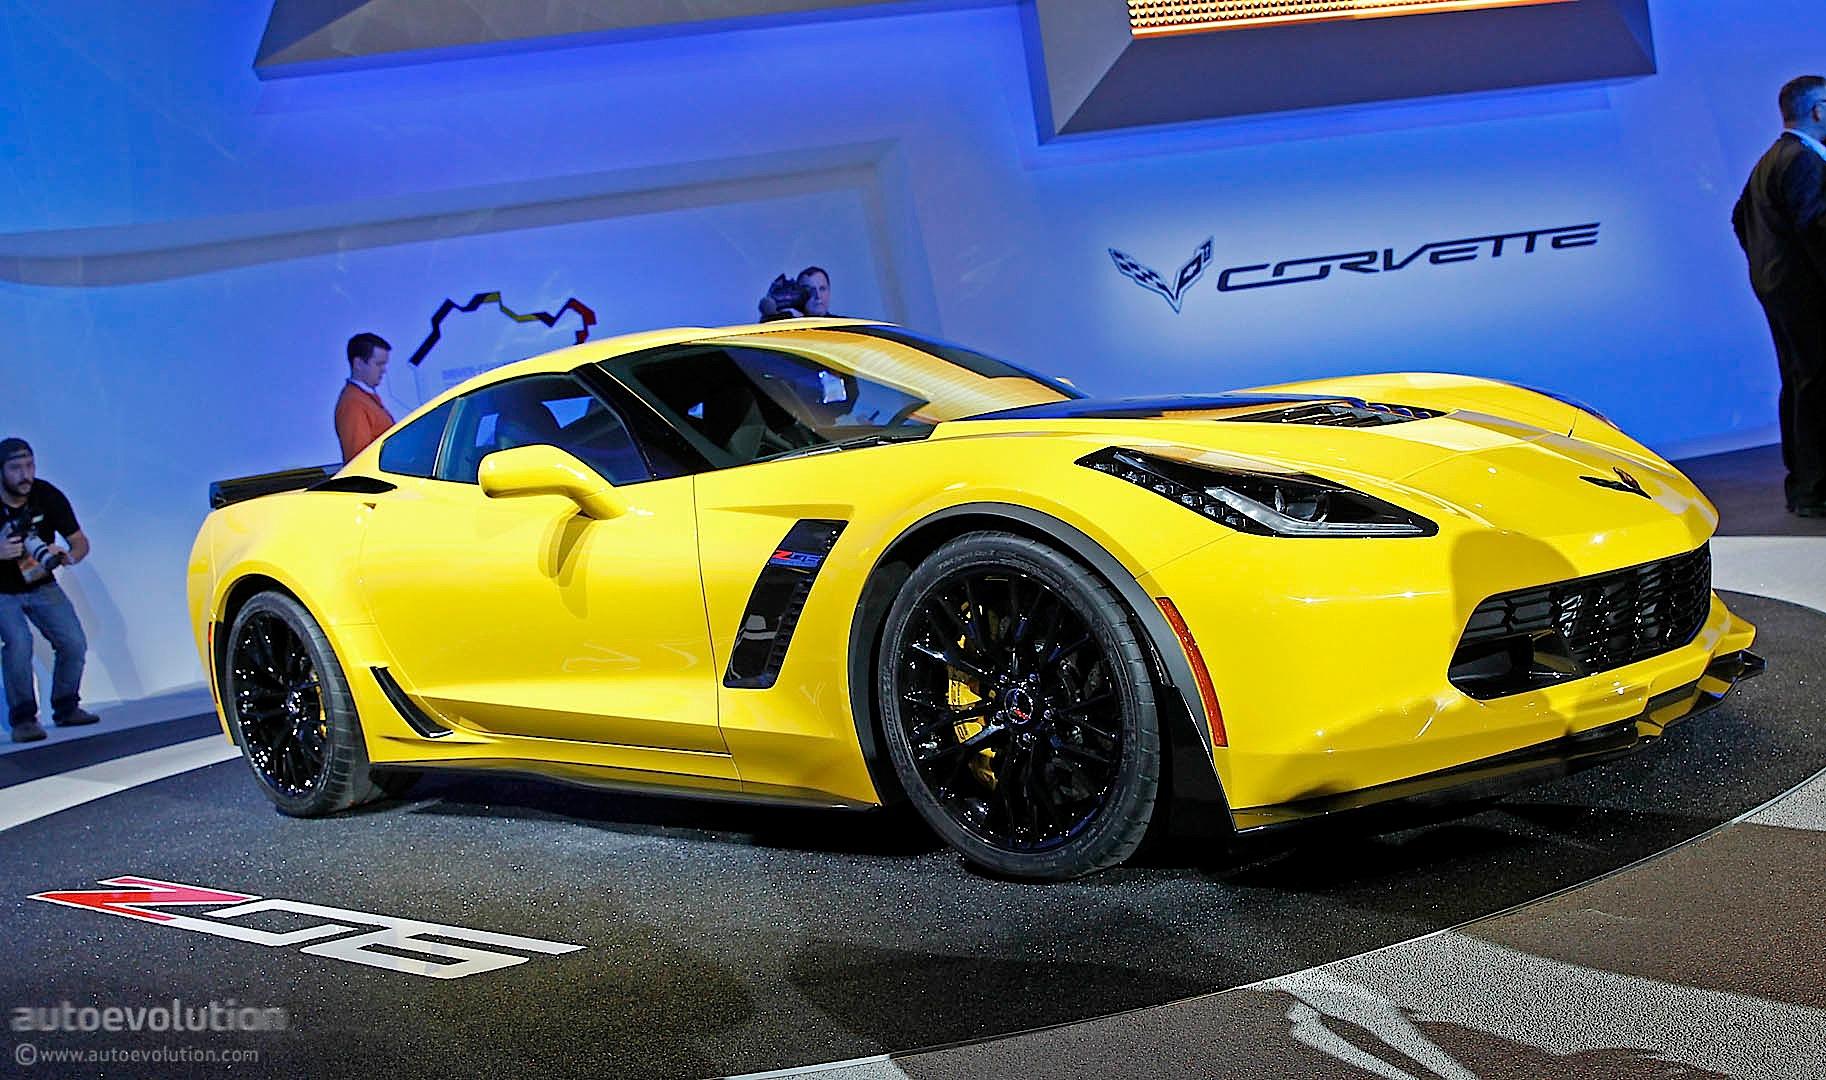 2015 corvette z06 officially revealed in detroit live photos autoevolution. Black Bedroom Furniture Sets. Home Design Ideas